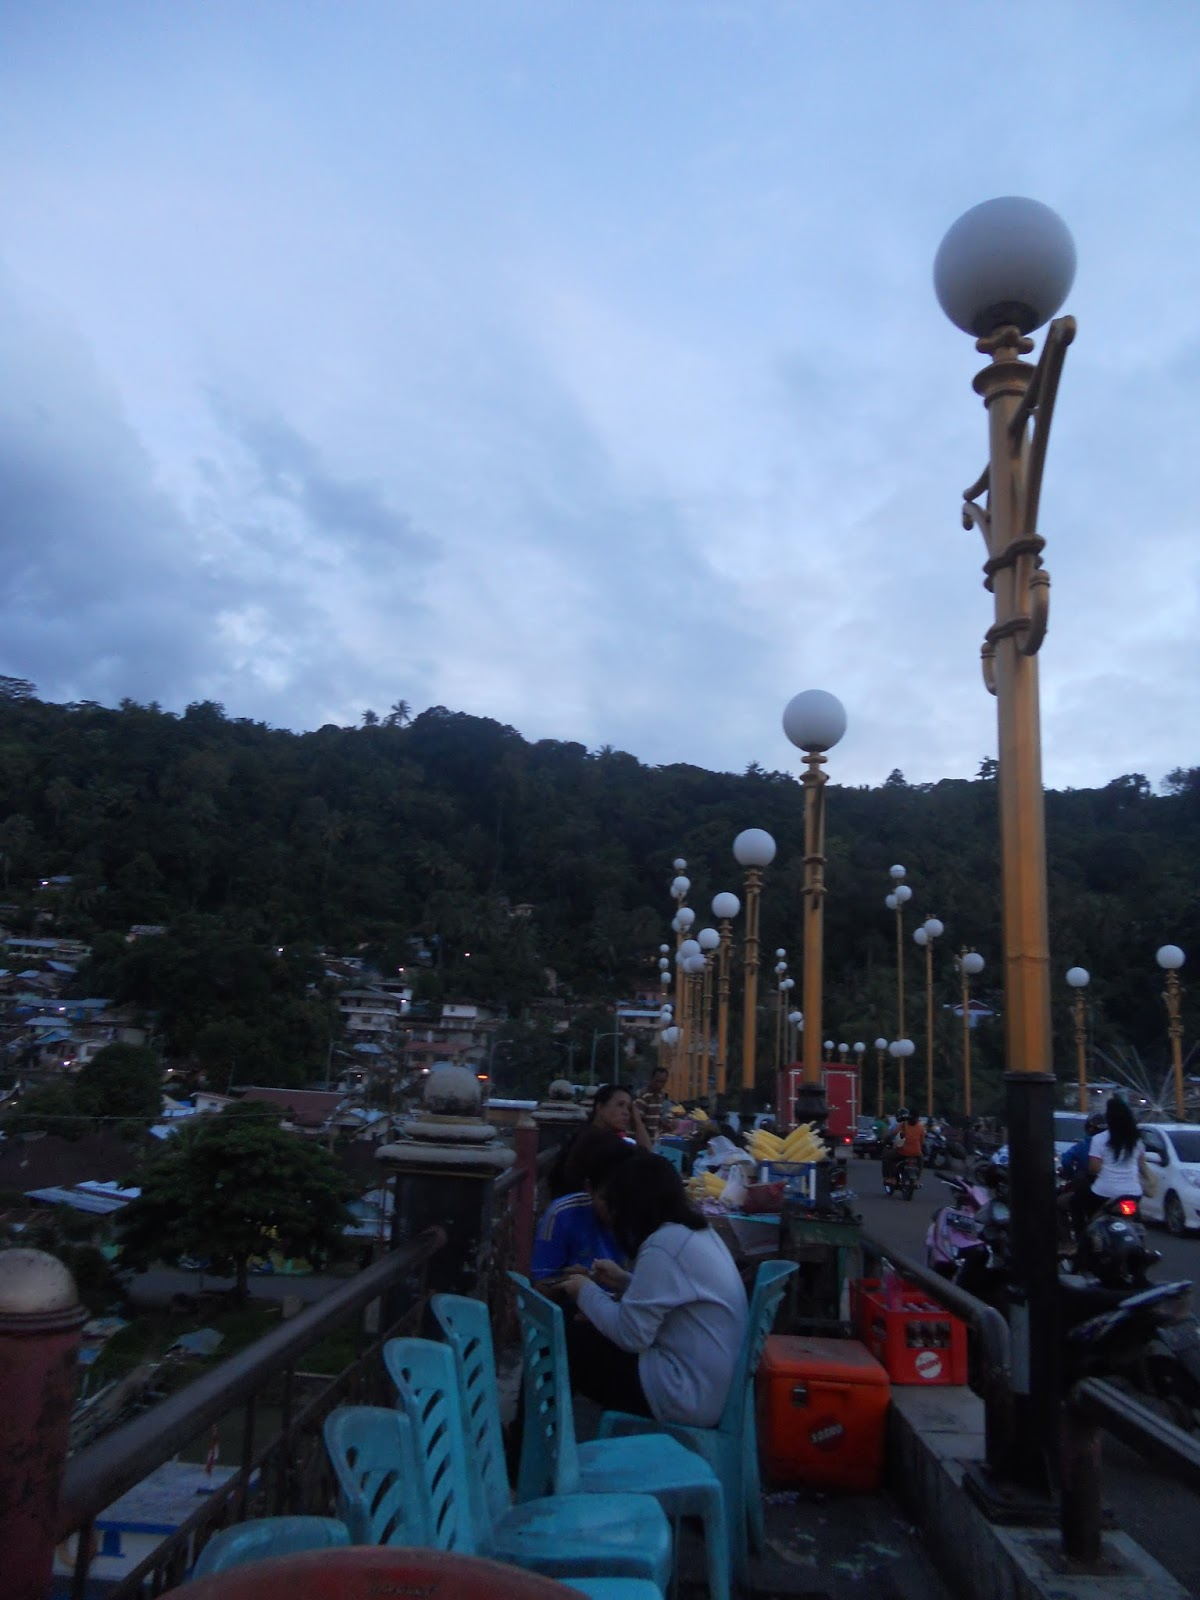 Panorama Jembatan Siti Nurbaya Rizkibio Gallery Deretan Pedagang Menjajakan Berbagai